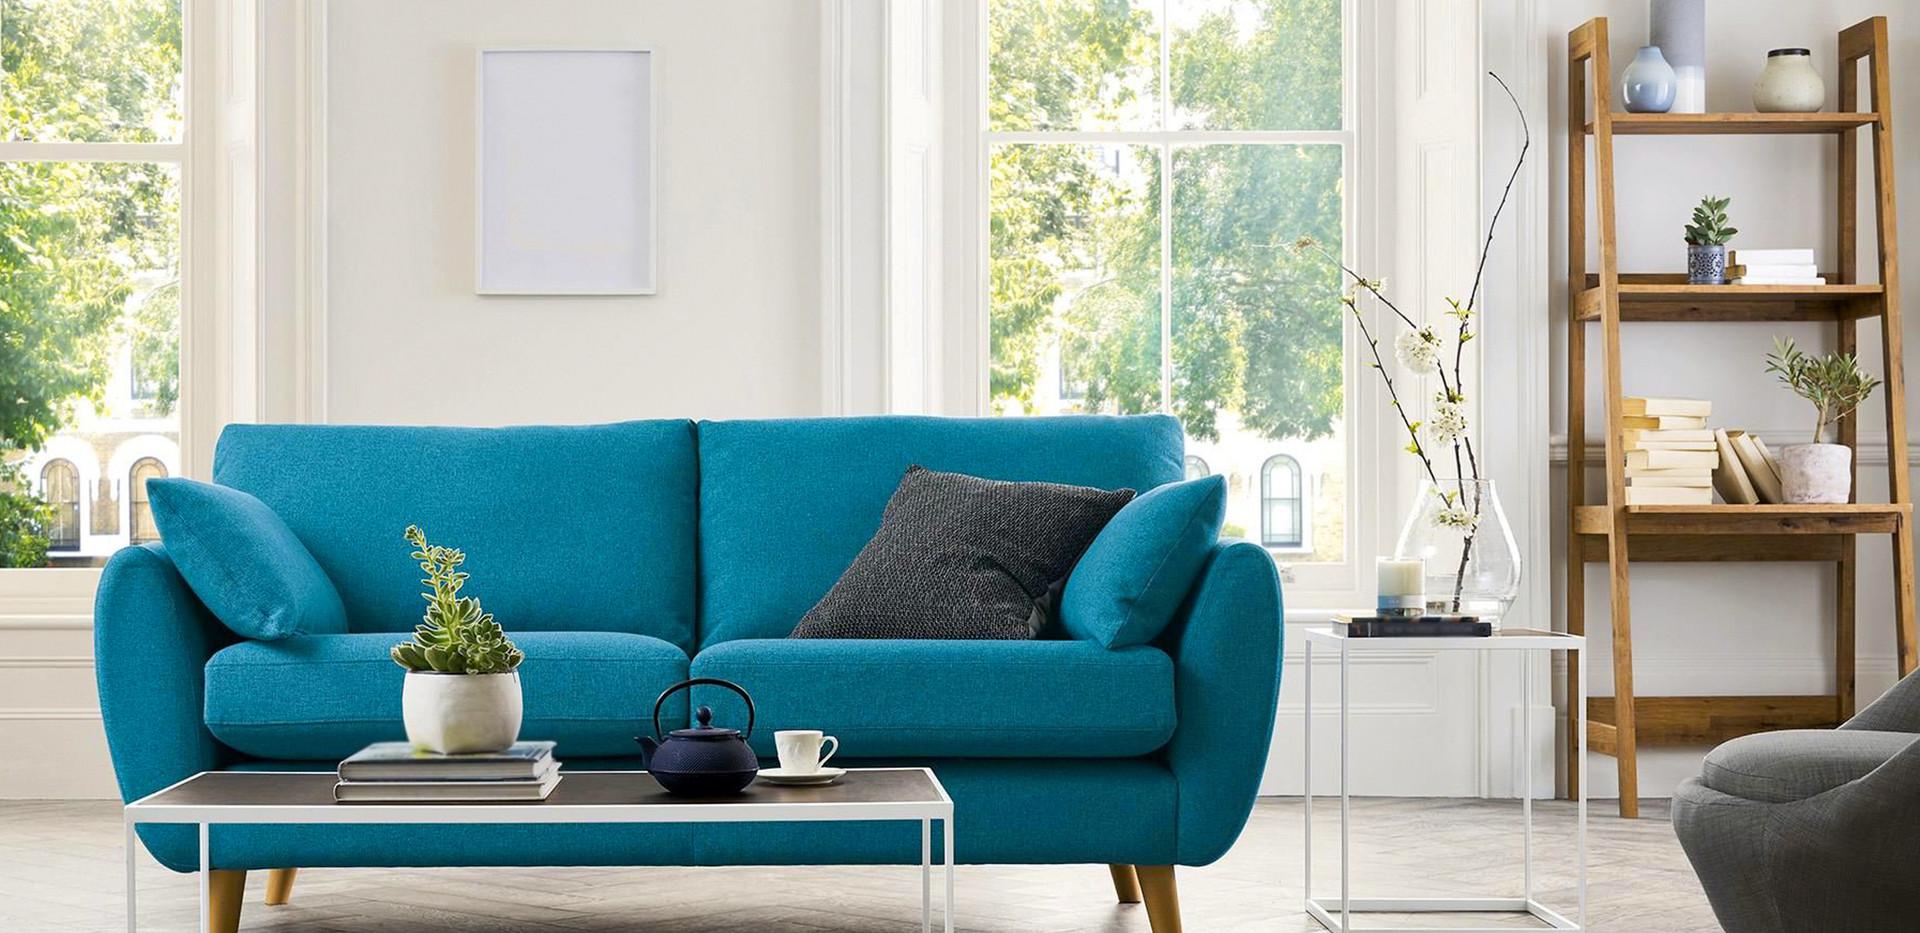 Contemporary living room with sofa.jpg